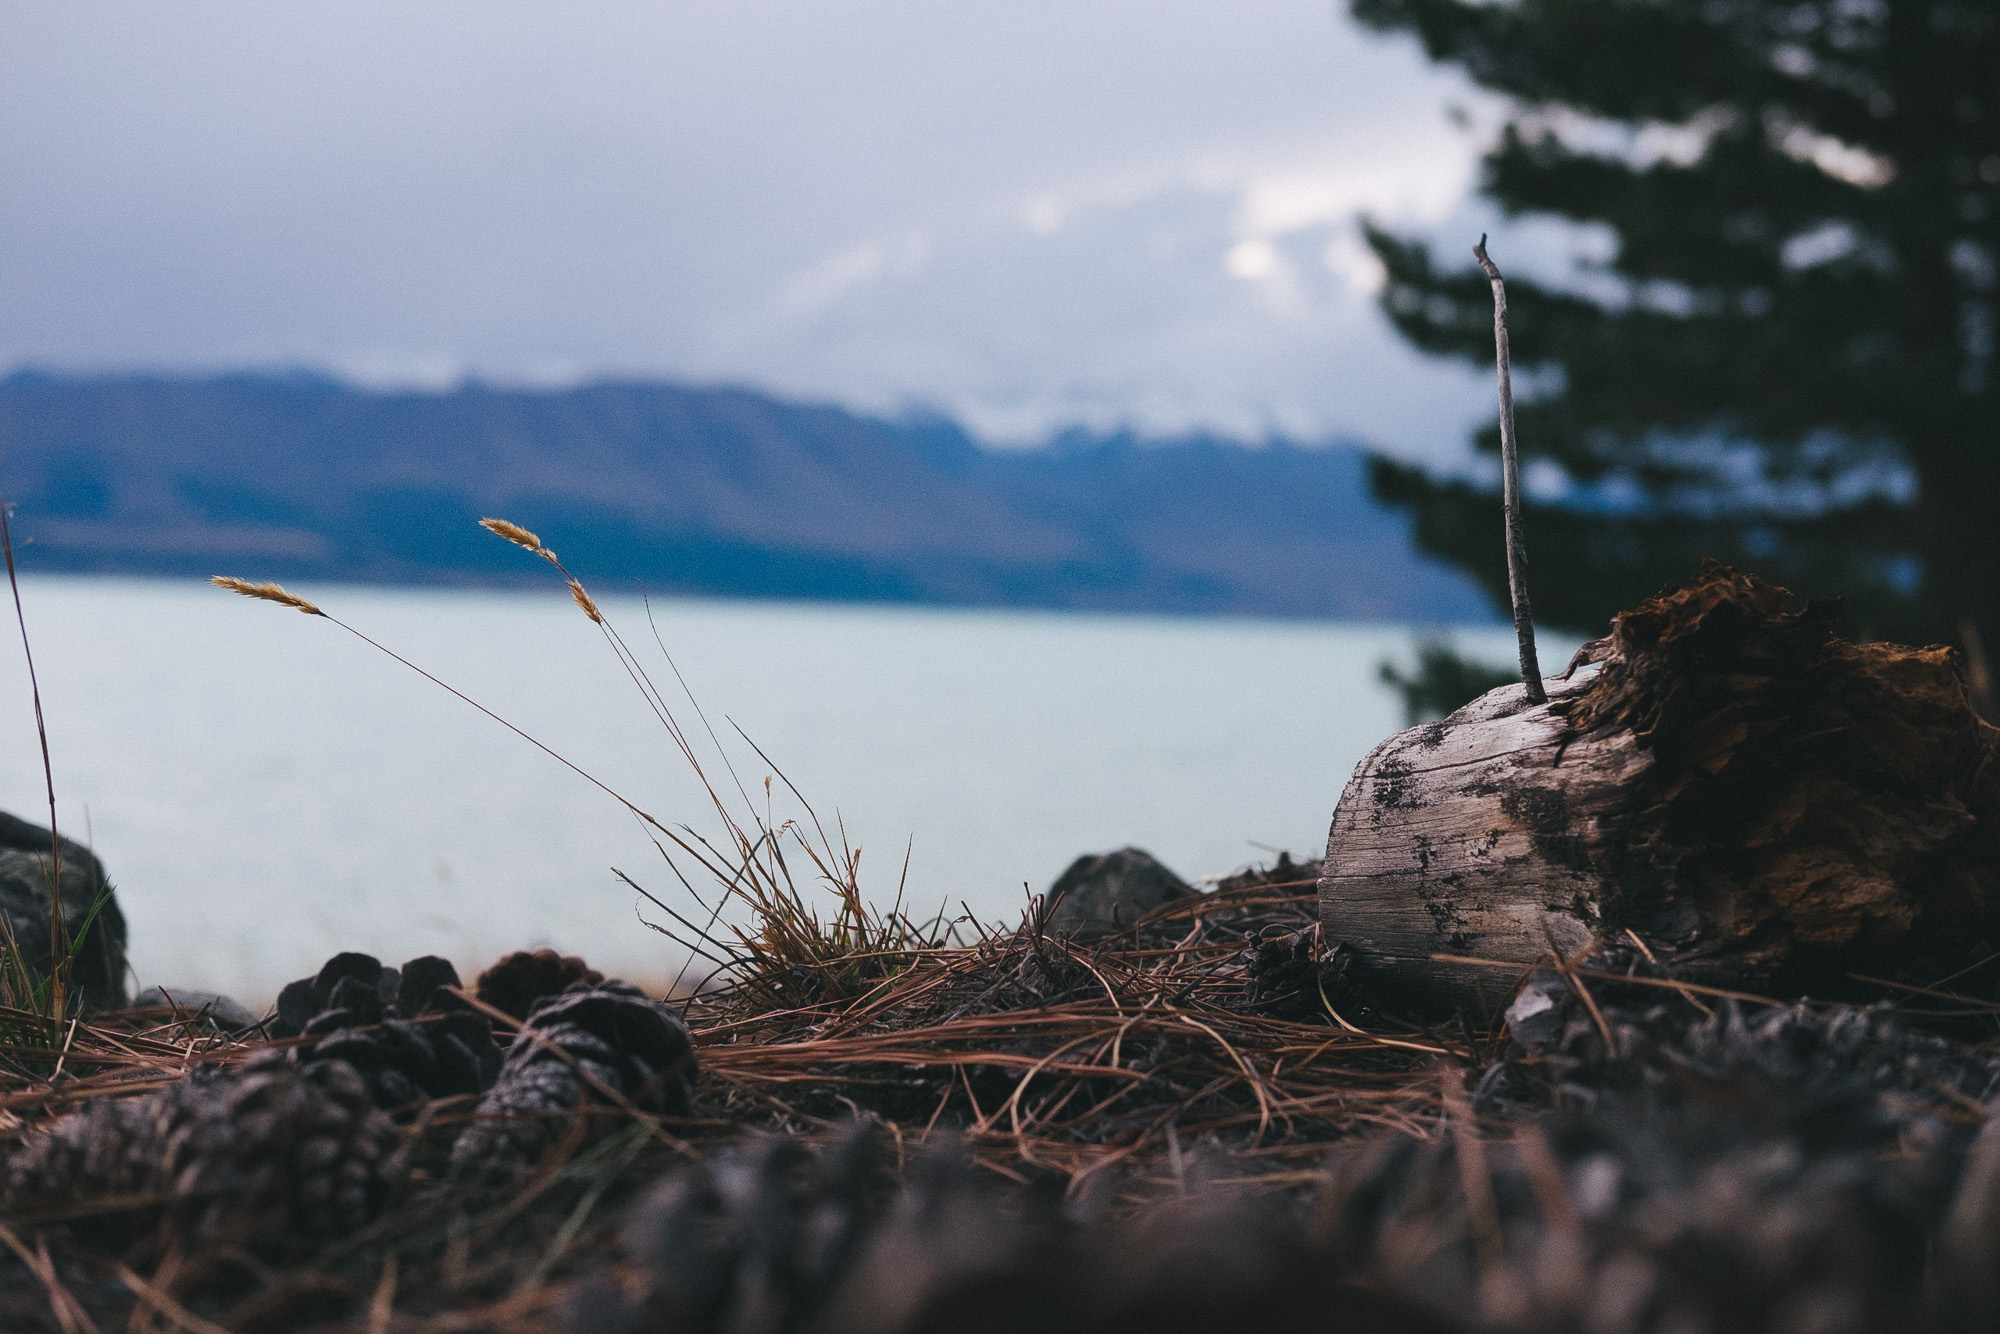 Lake Pukaki